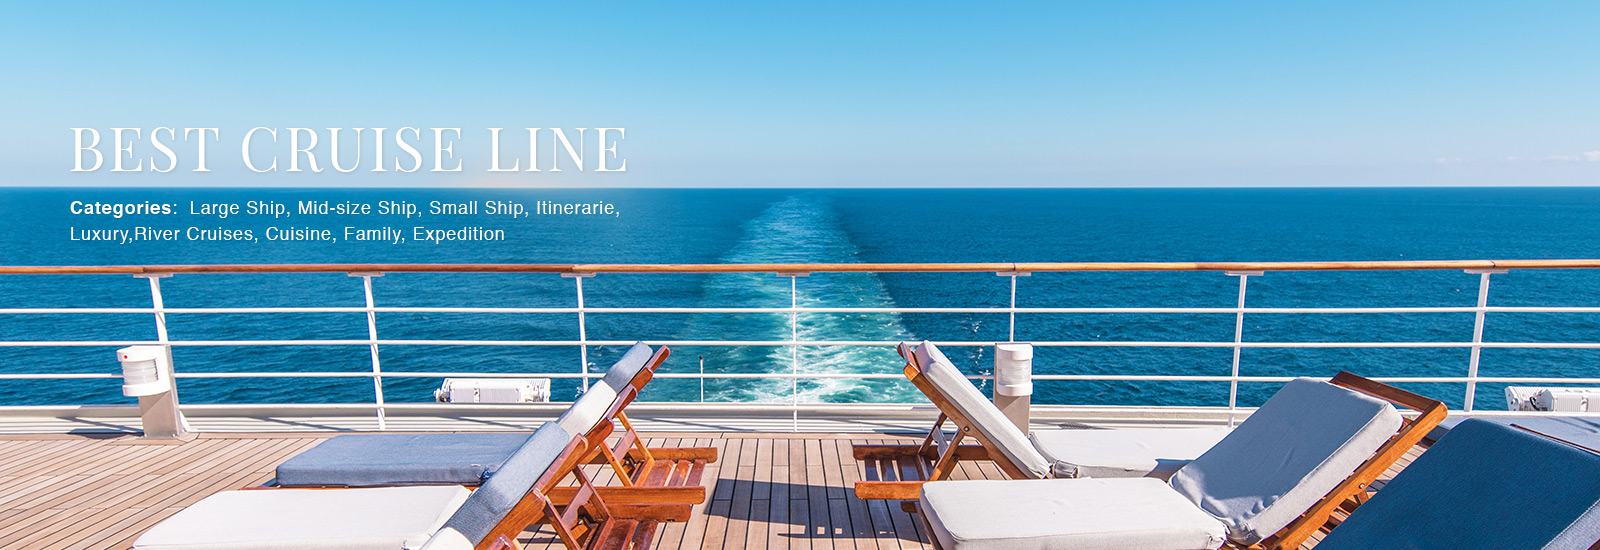 RCA Best Cruise Line